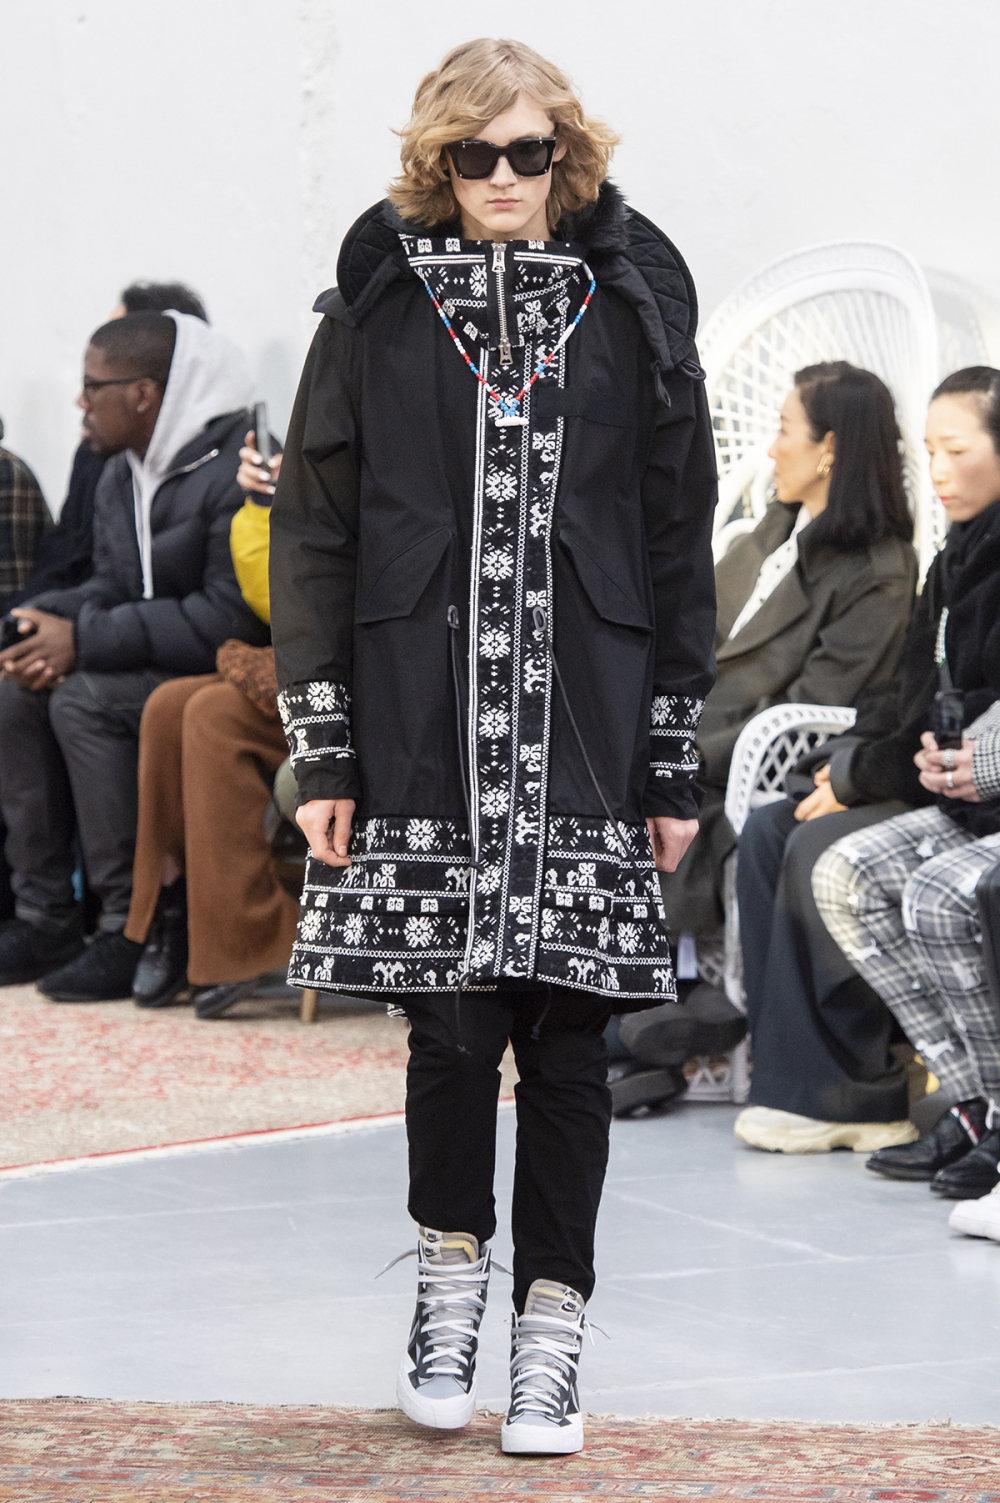 Sacai时装系列超大号黑色圆领毛衣和长款绿色北欧毛衣连衣裙-27.jpg